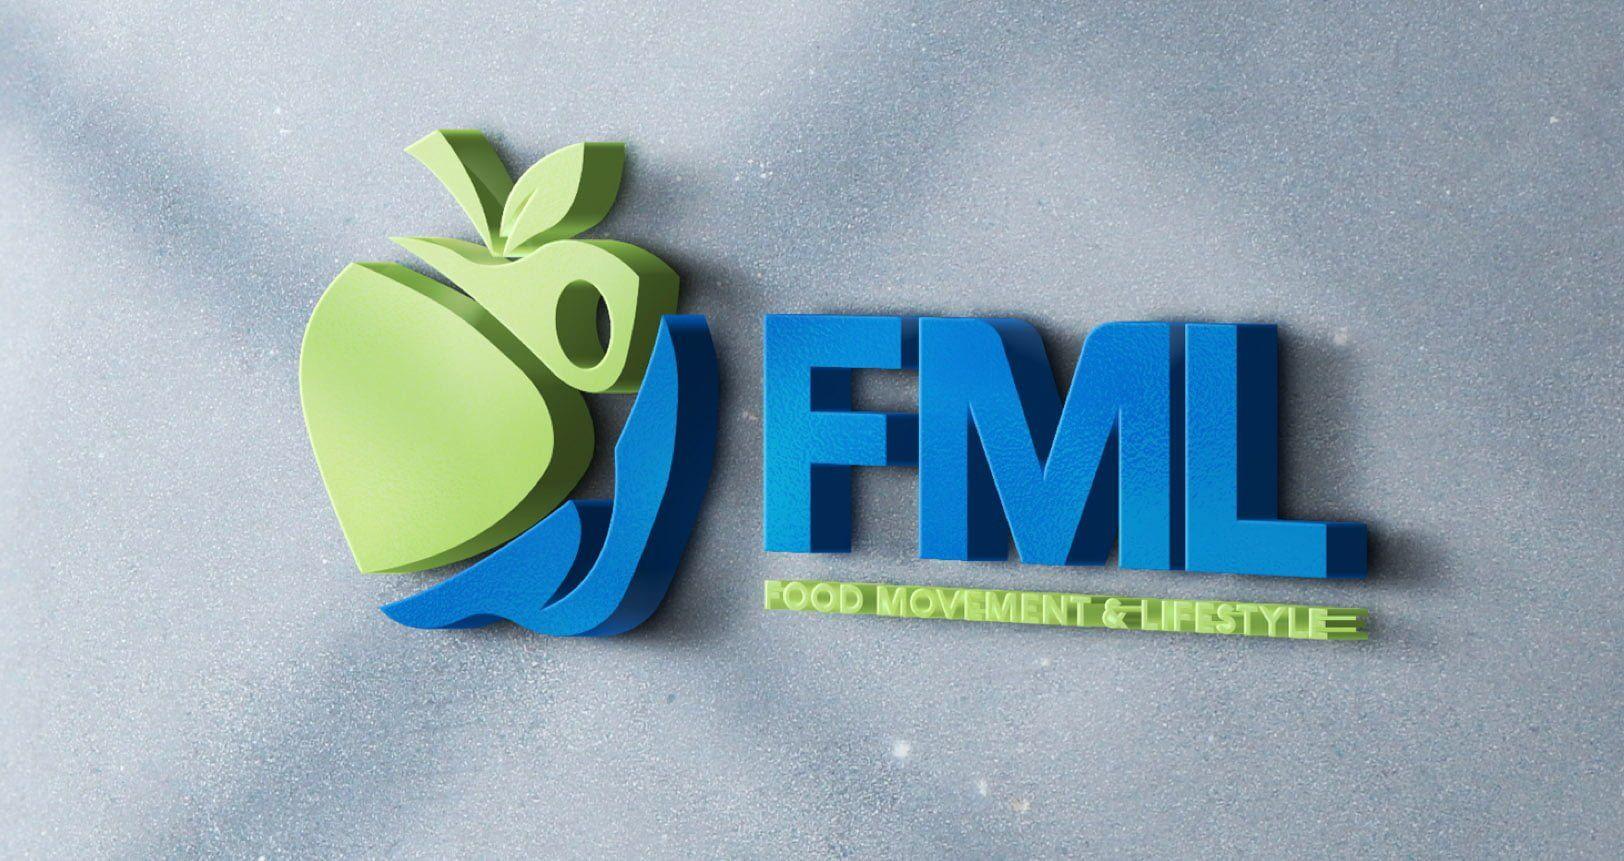 Food Movement Lifestyle Branding